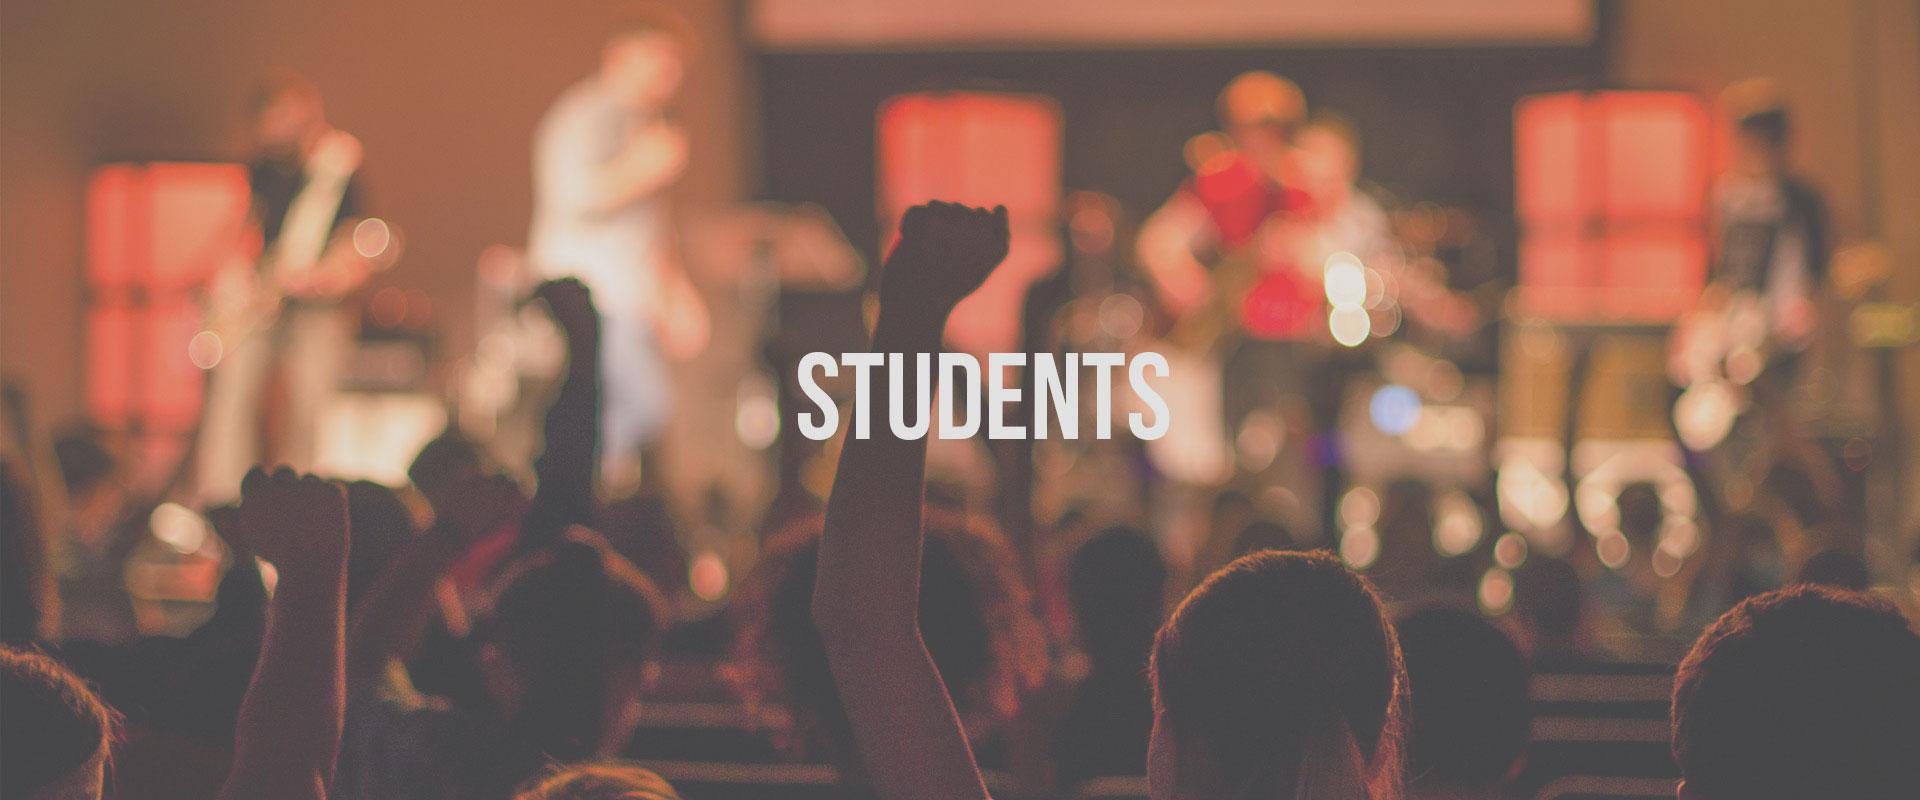 students-header